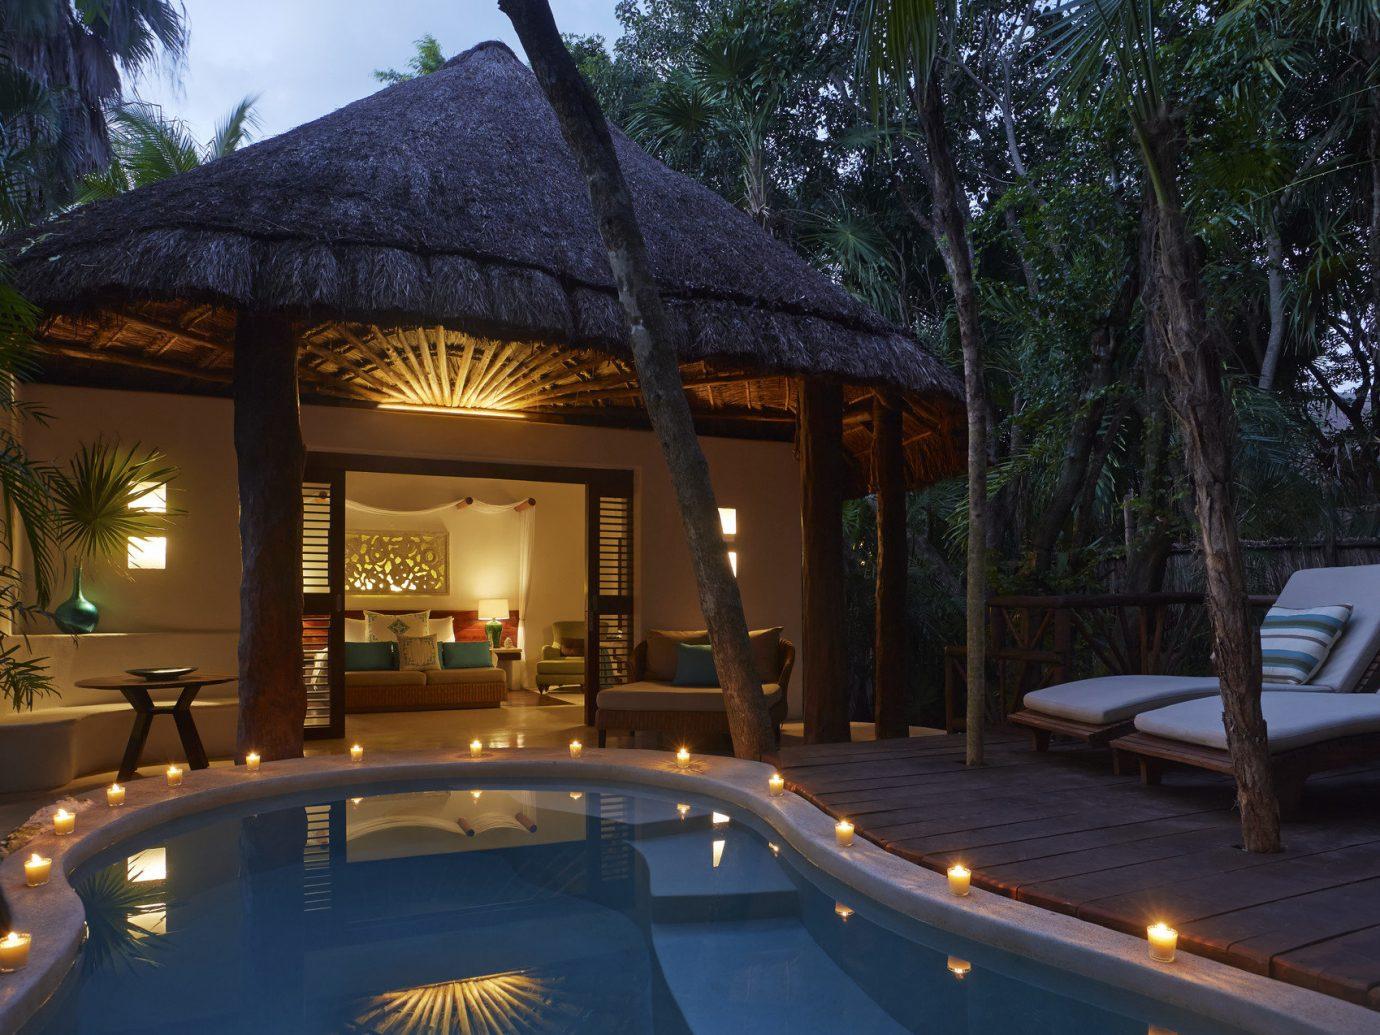 Beach Honeymoon Hotels Mexico Romance Tulum tree outdoor swimming pool estate Resort building house vacation home Villa mansion backyard restaurant